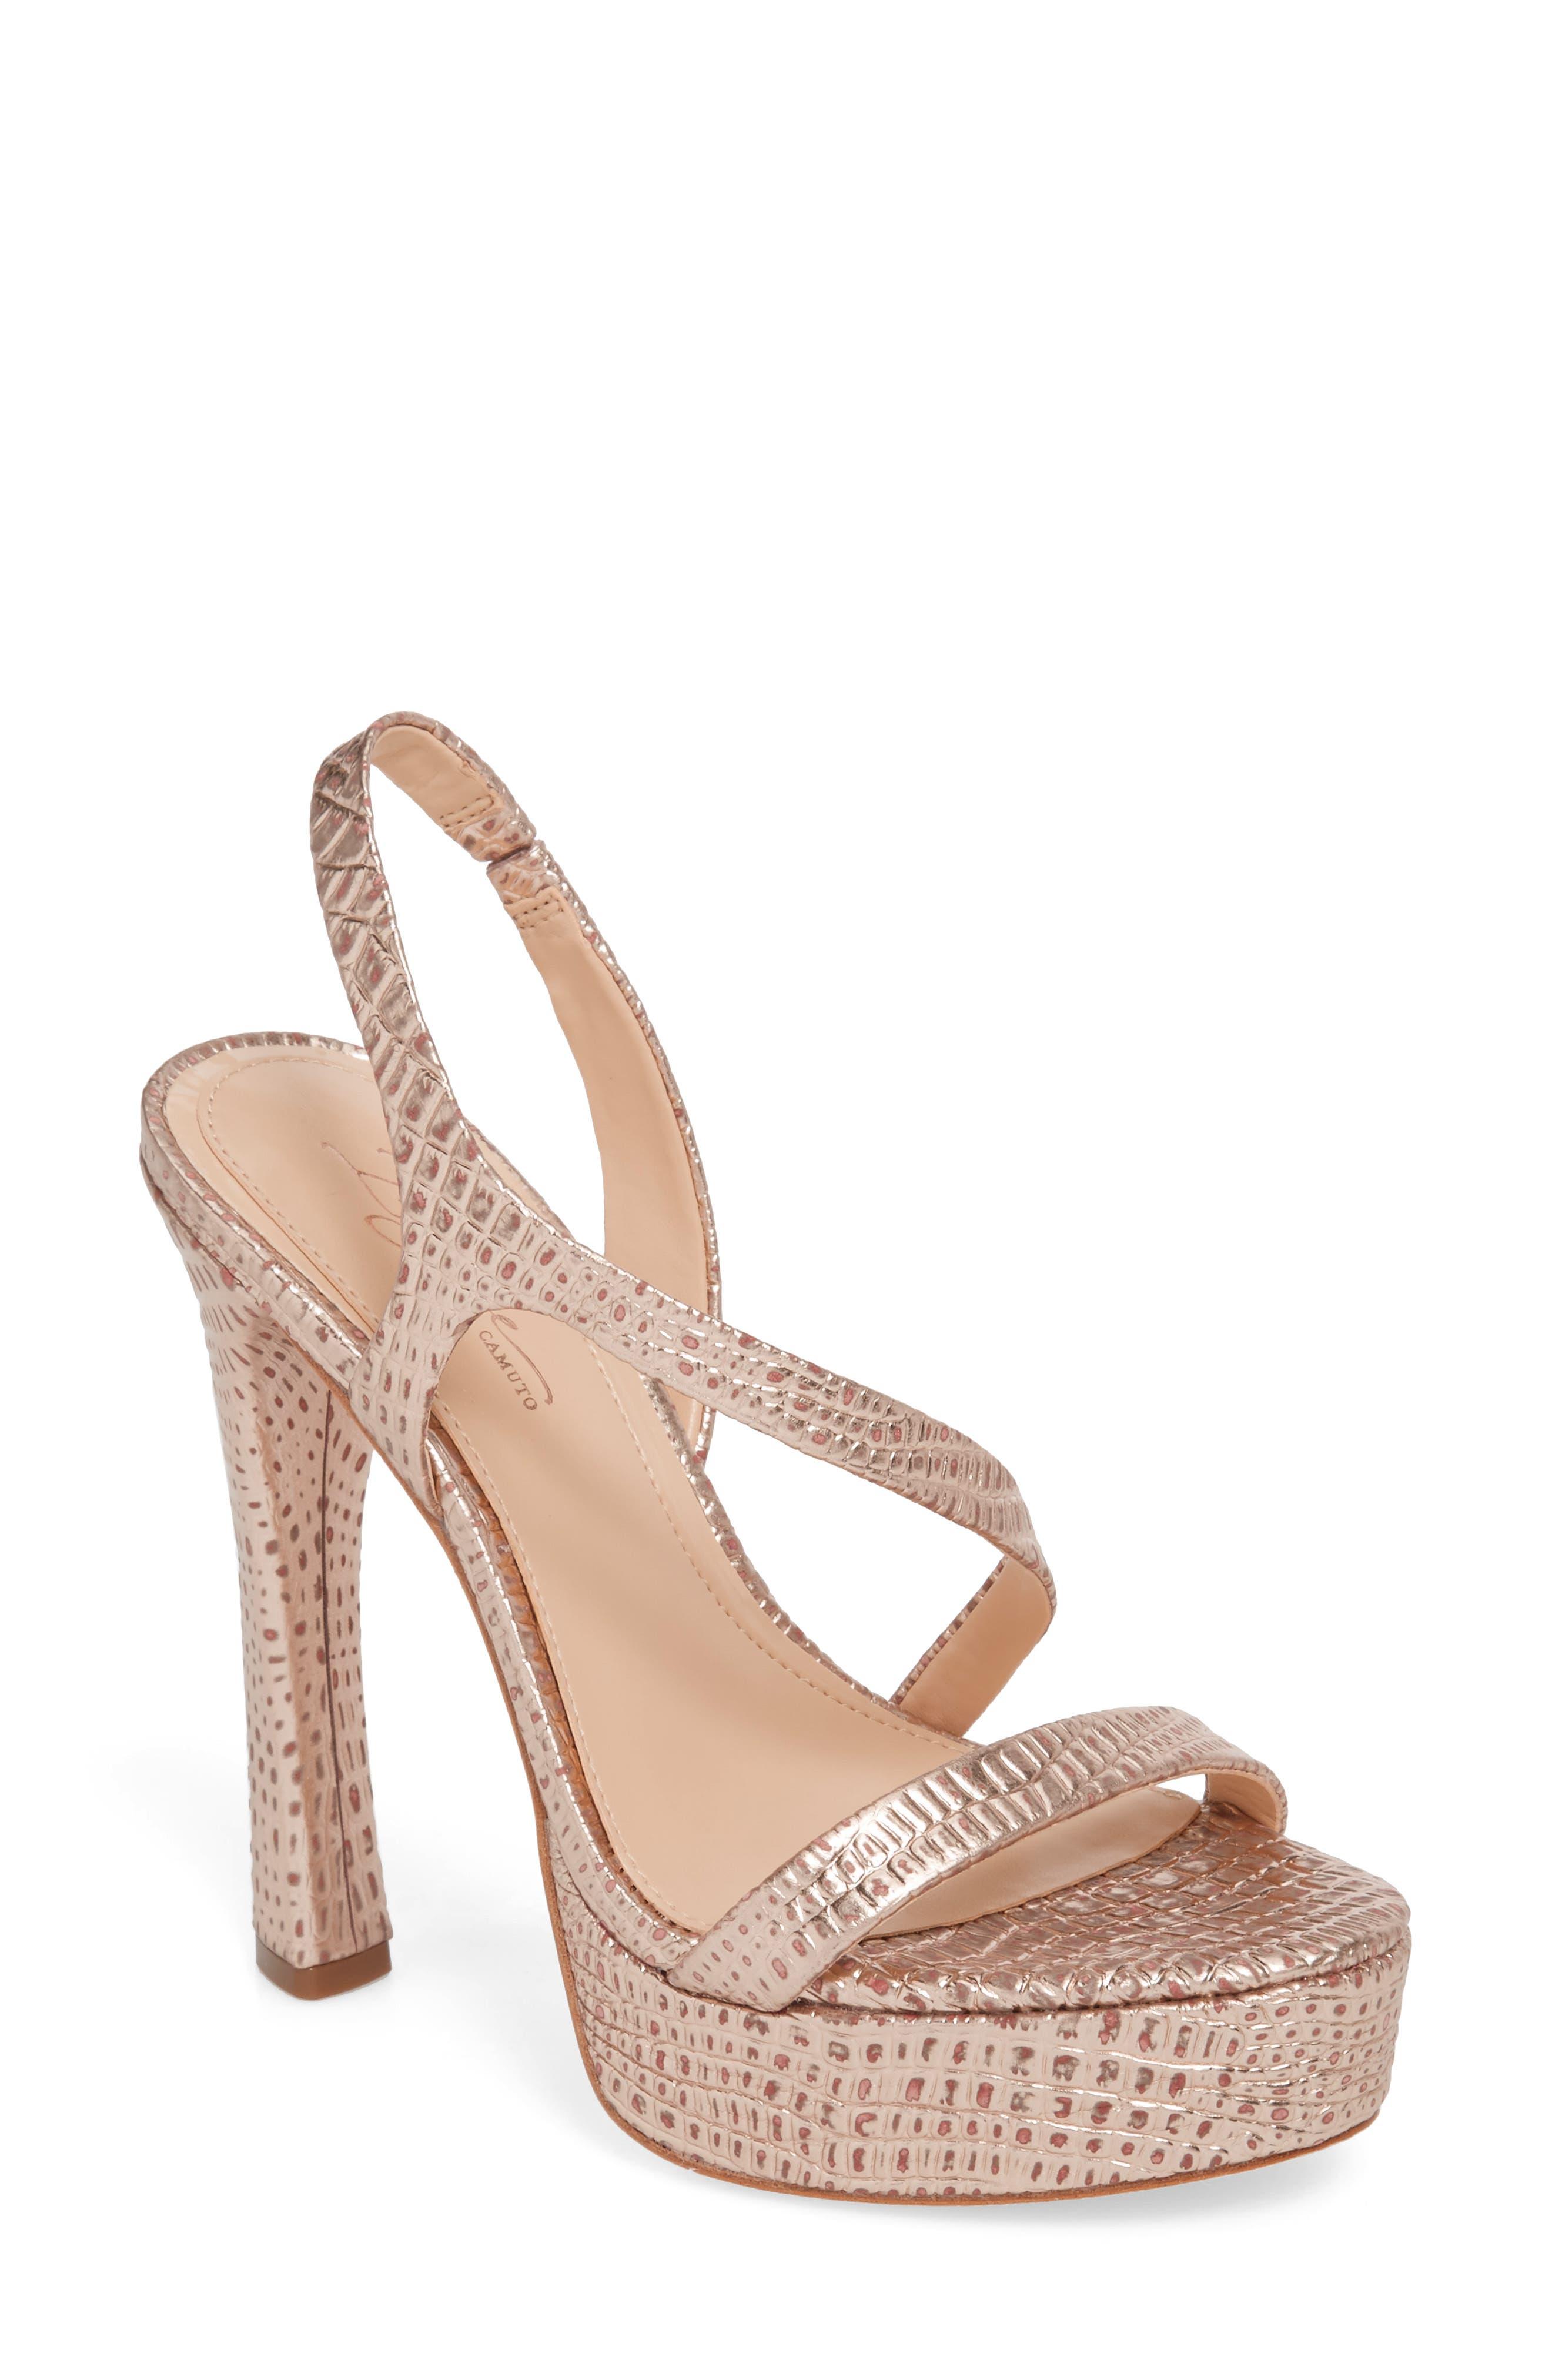 Imagine By Vince Camuto Prent Asymmetrical Platform Sandal, Pink